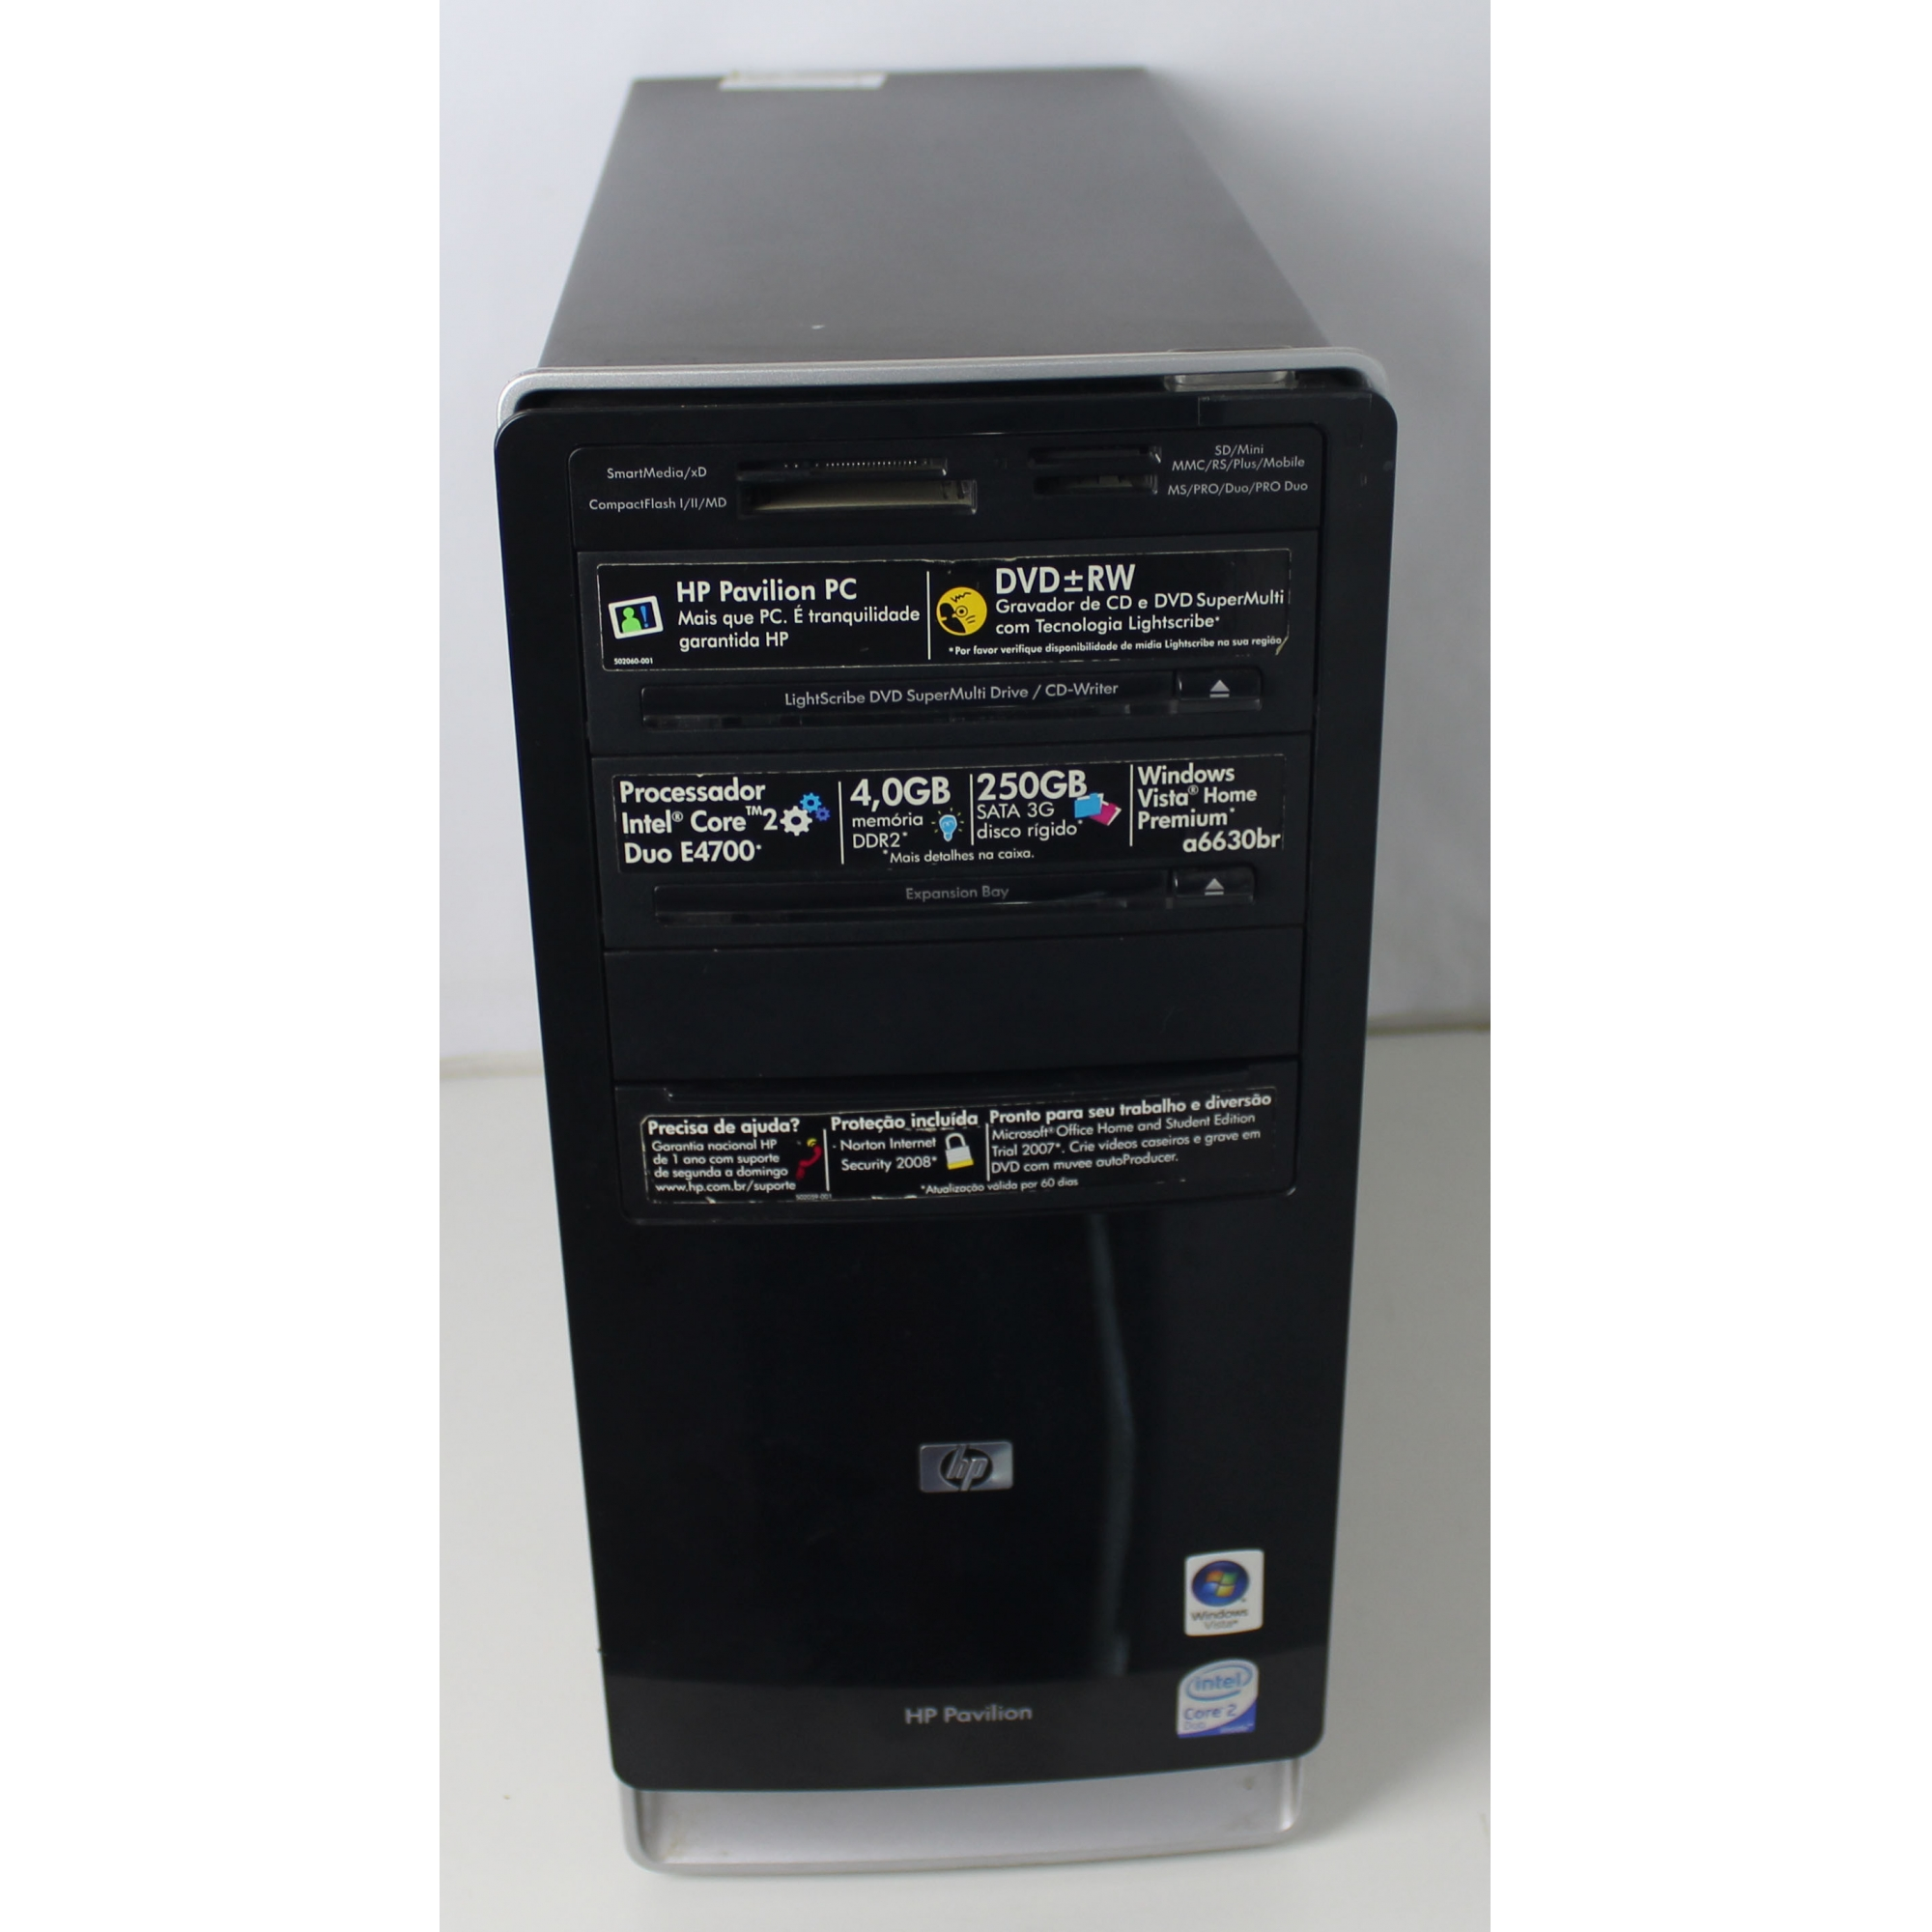 CPU HP Pavilion a6630br Intel Core 2 Duo 2.6GHz 4GB HD-250GB